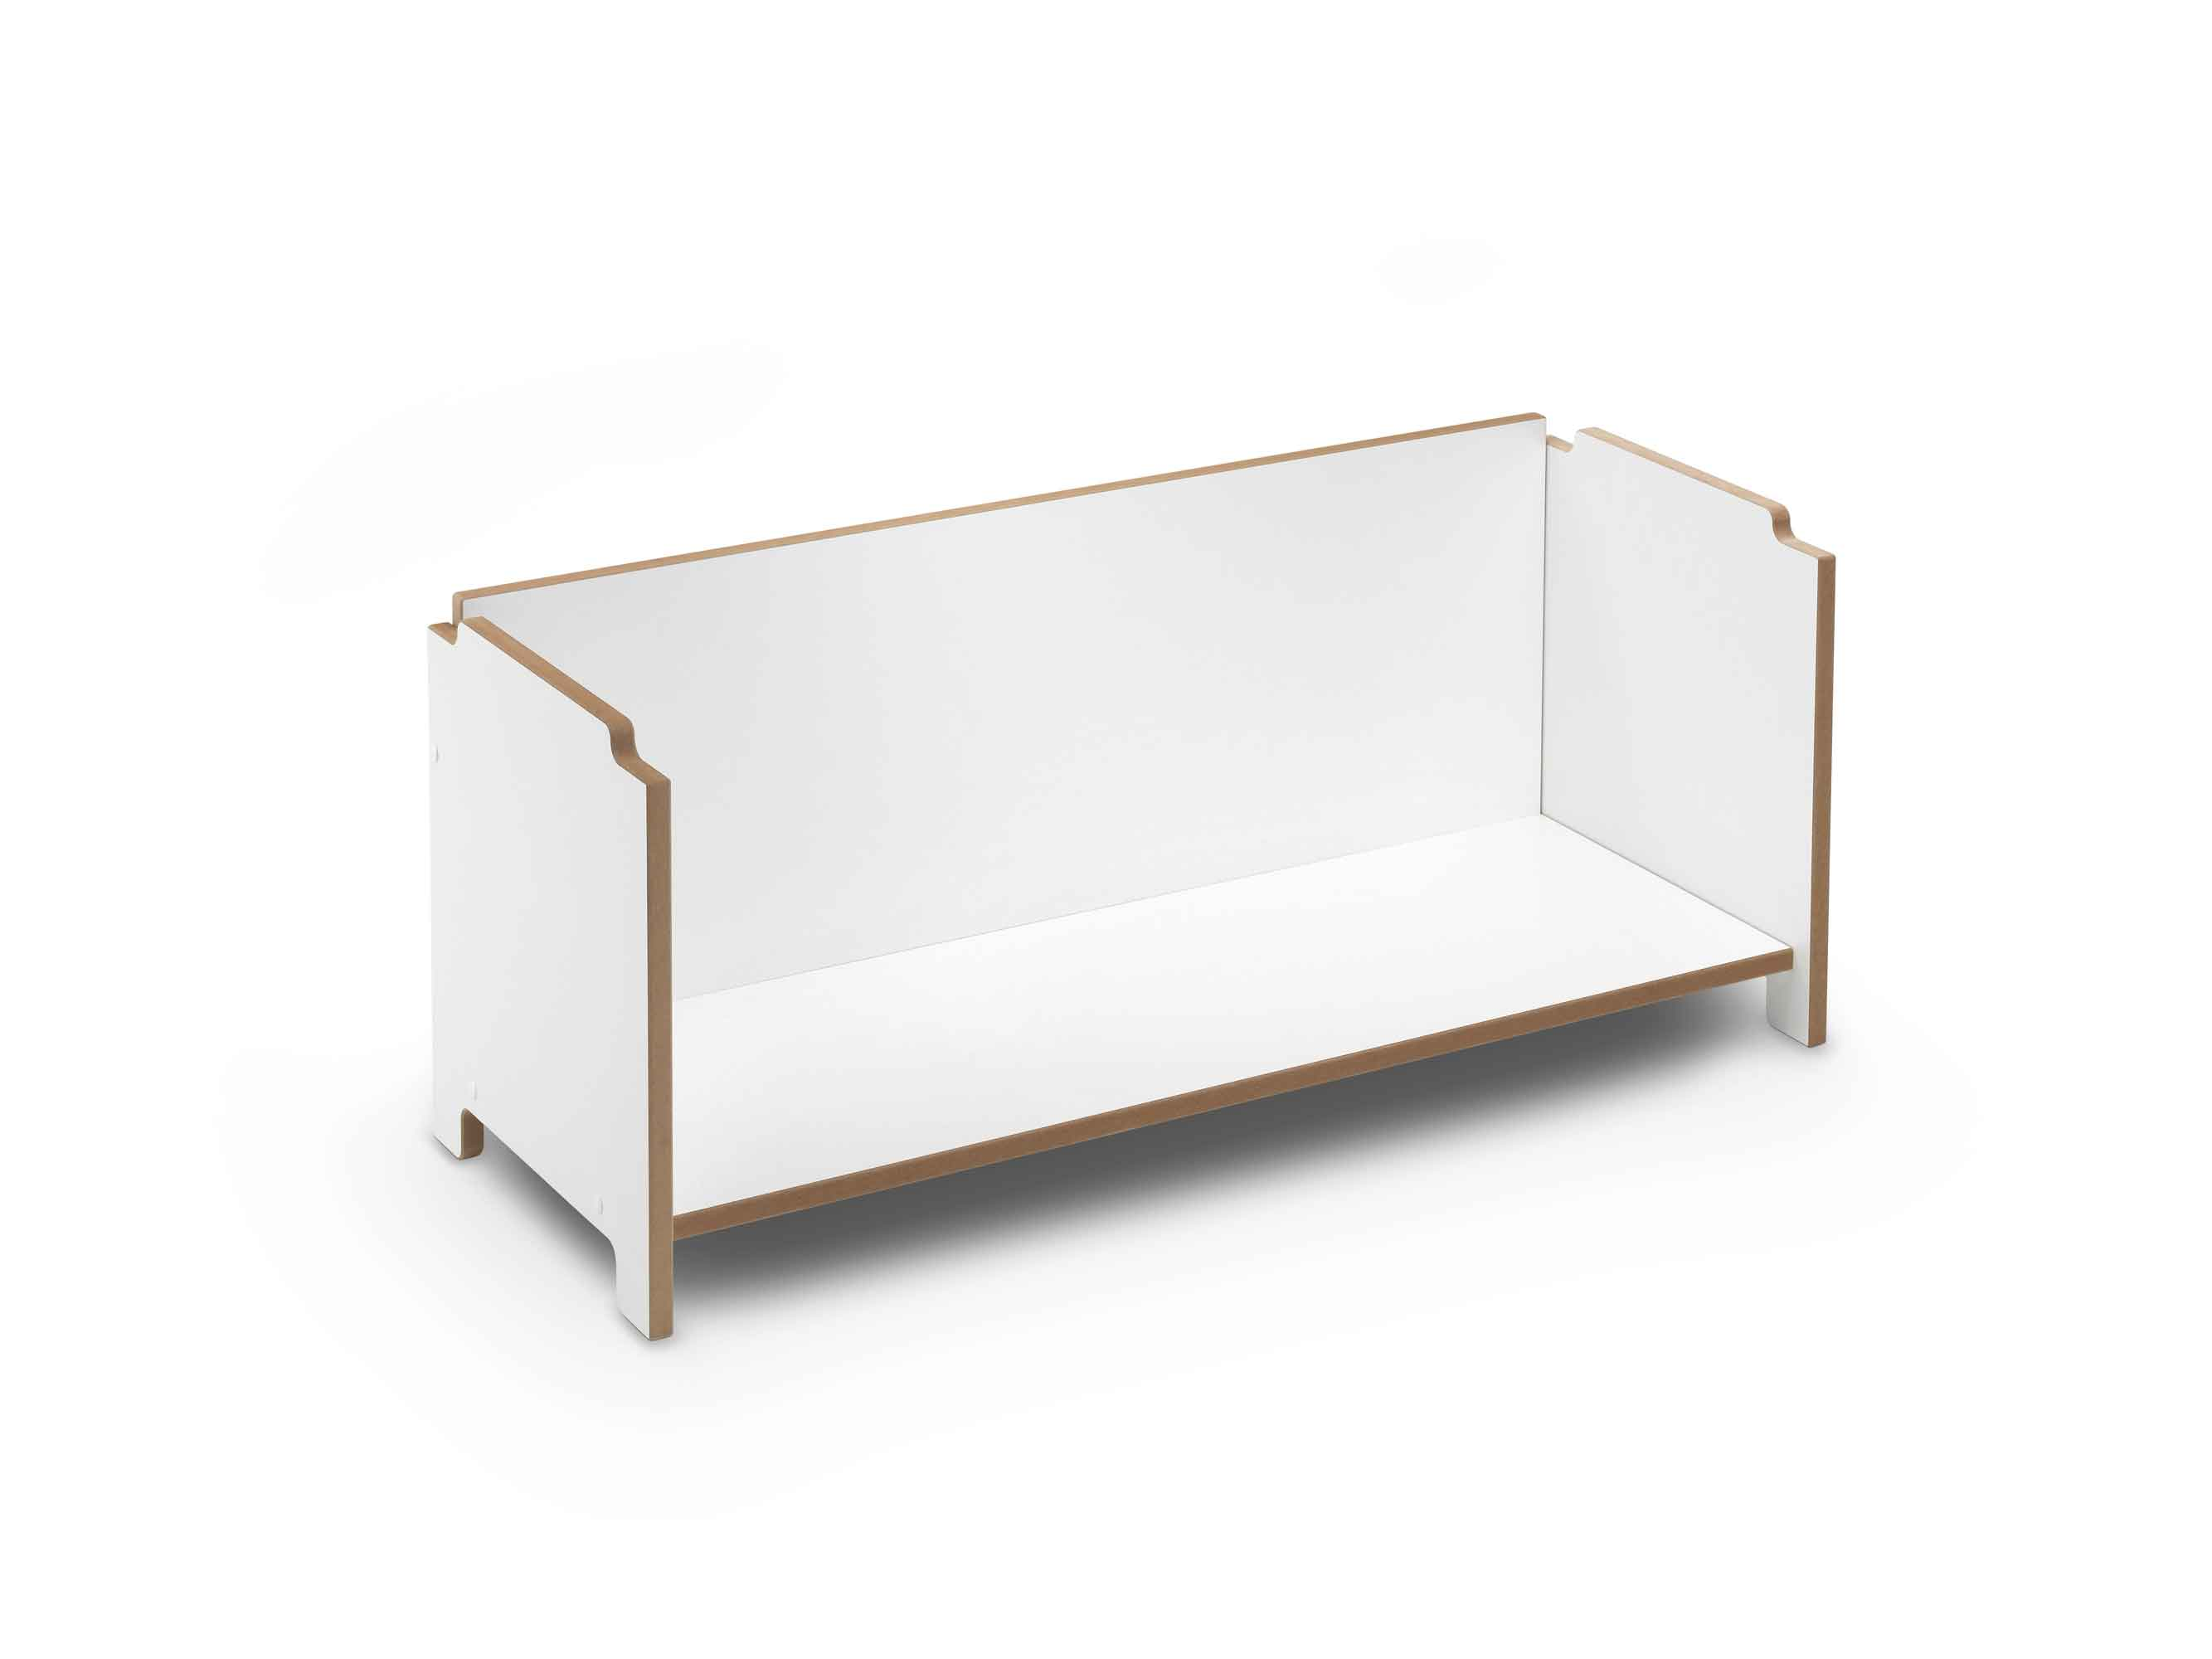 harry regal offen 33 5cm tief country living shop. Black Bedroom Furniture Sets. Home Design Ideas